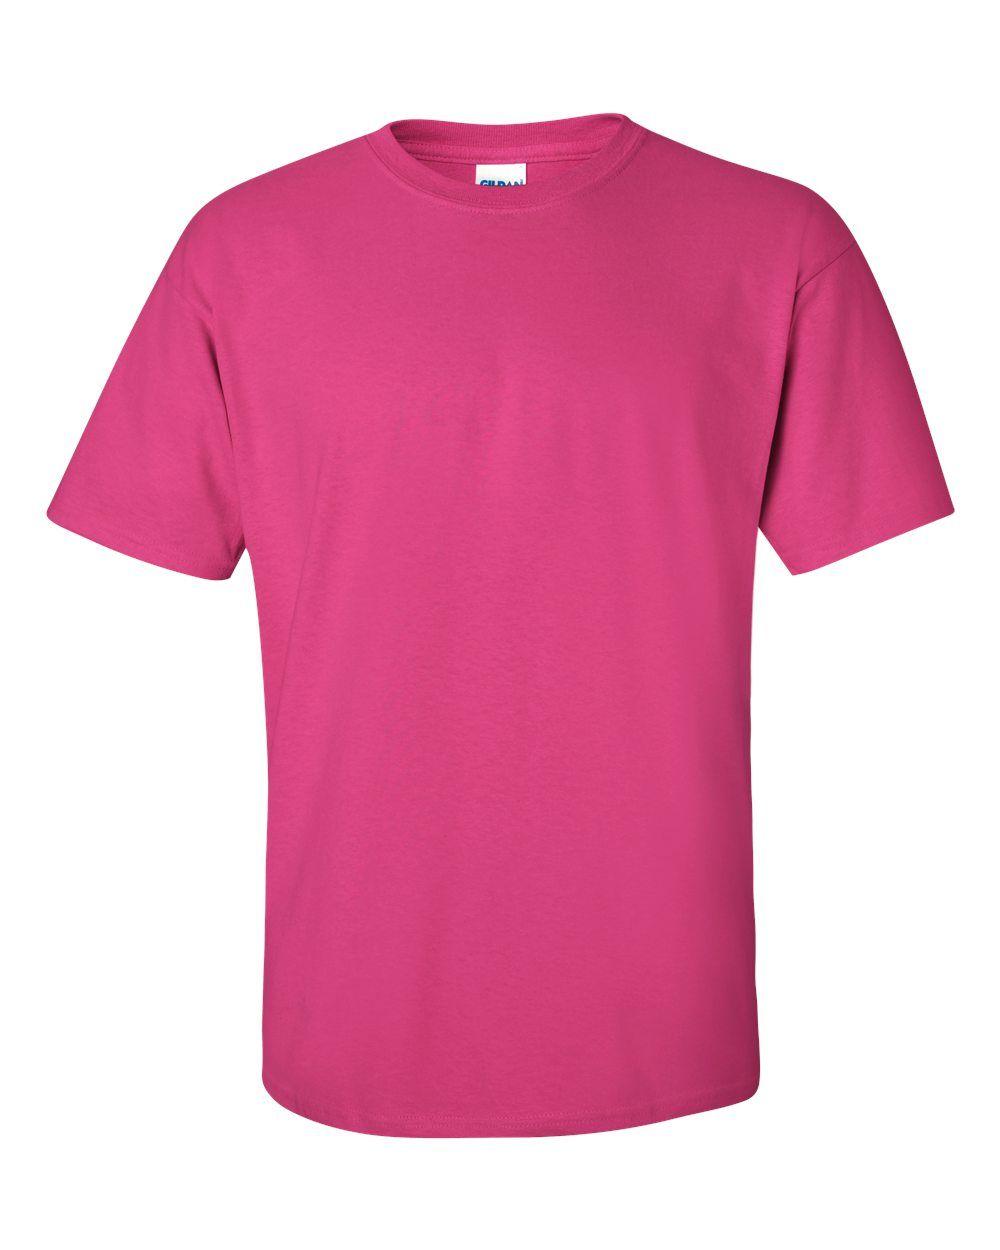 Gildan 2000 ultra cotton tshirt wholesale and bulk